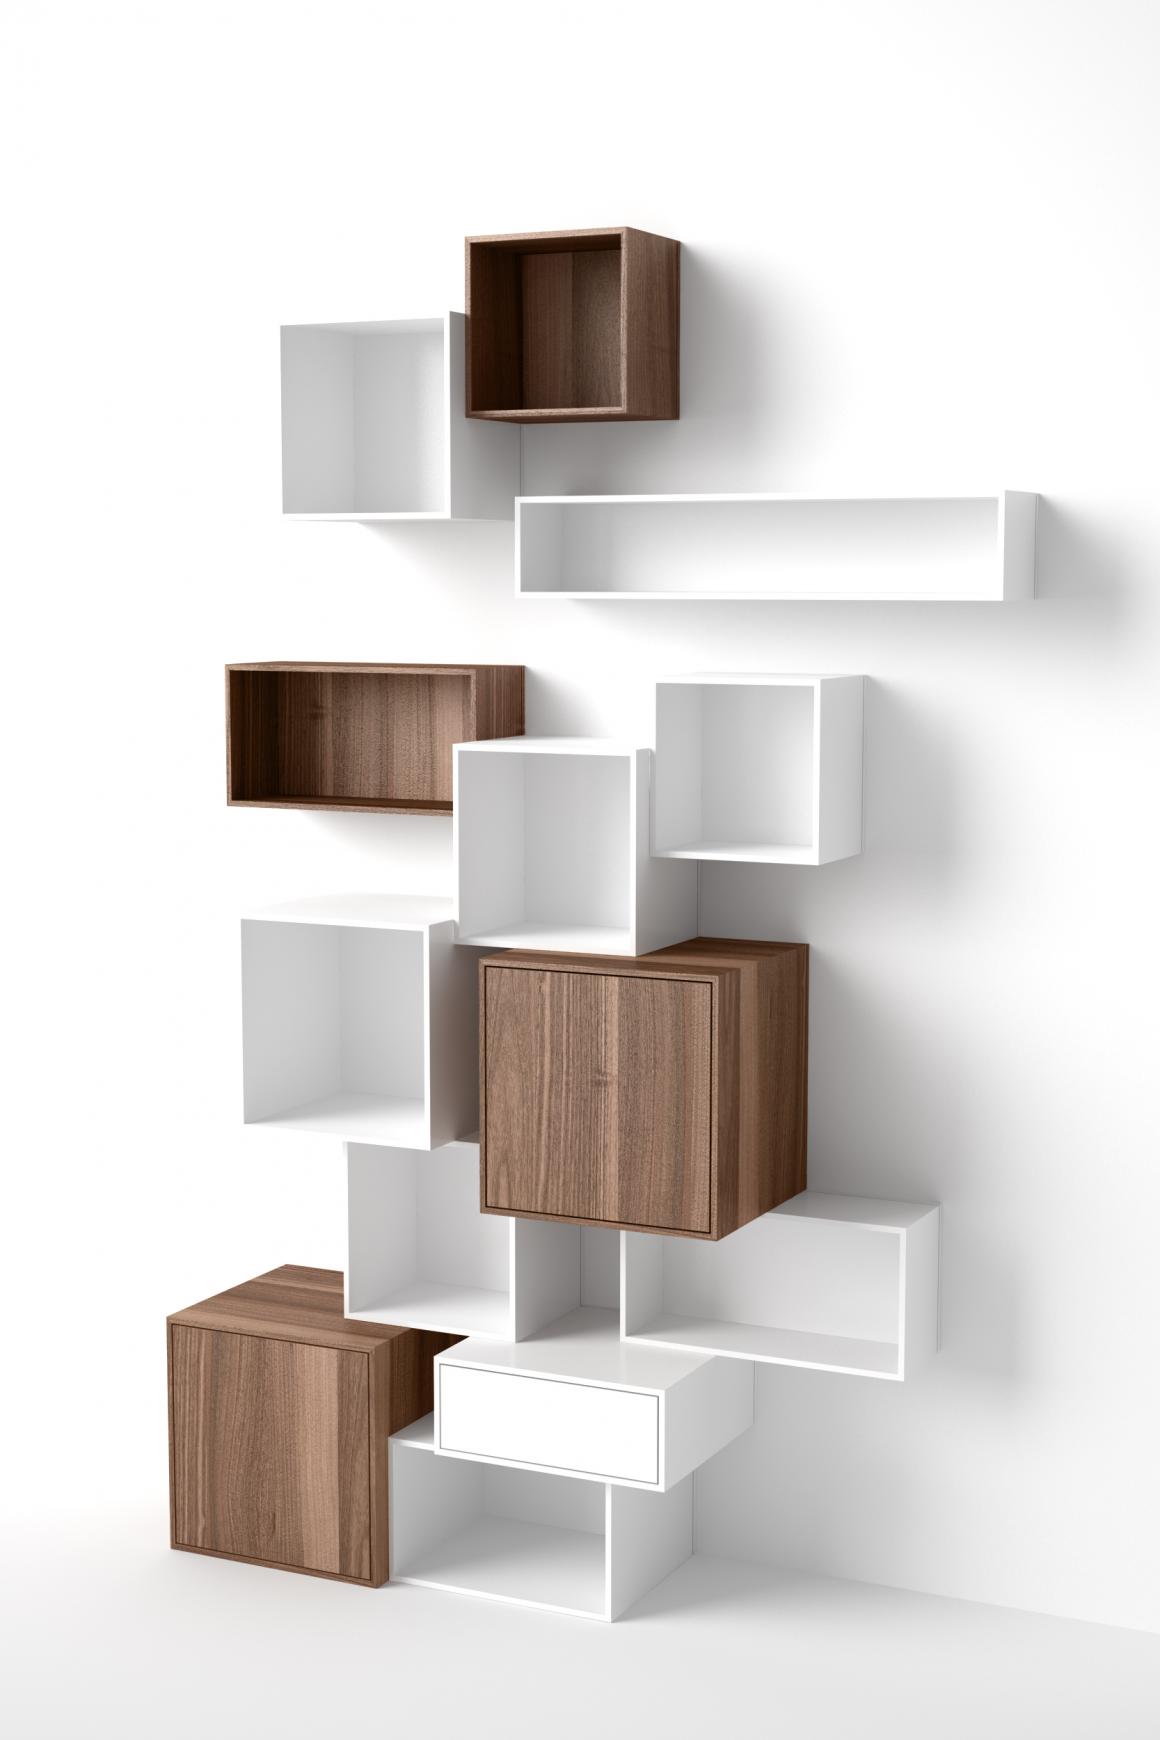 Top 35 Unique Shelf Design Ideas Engineering Discoveries Nel